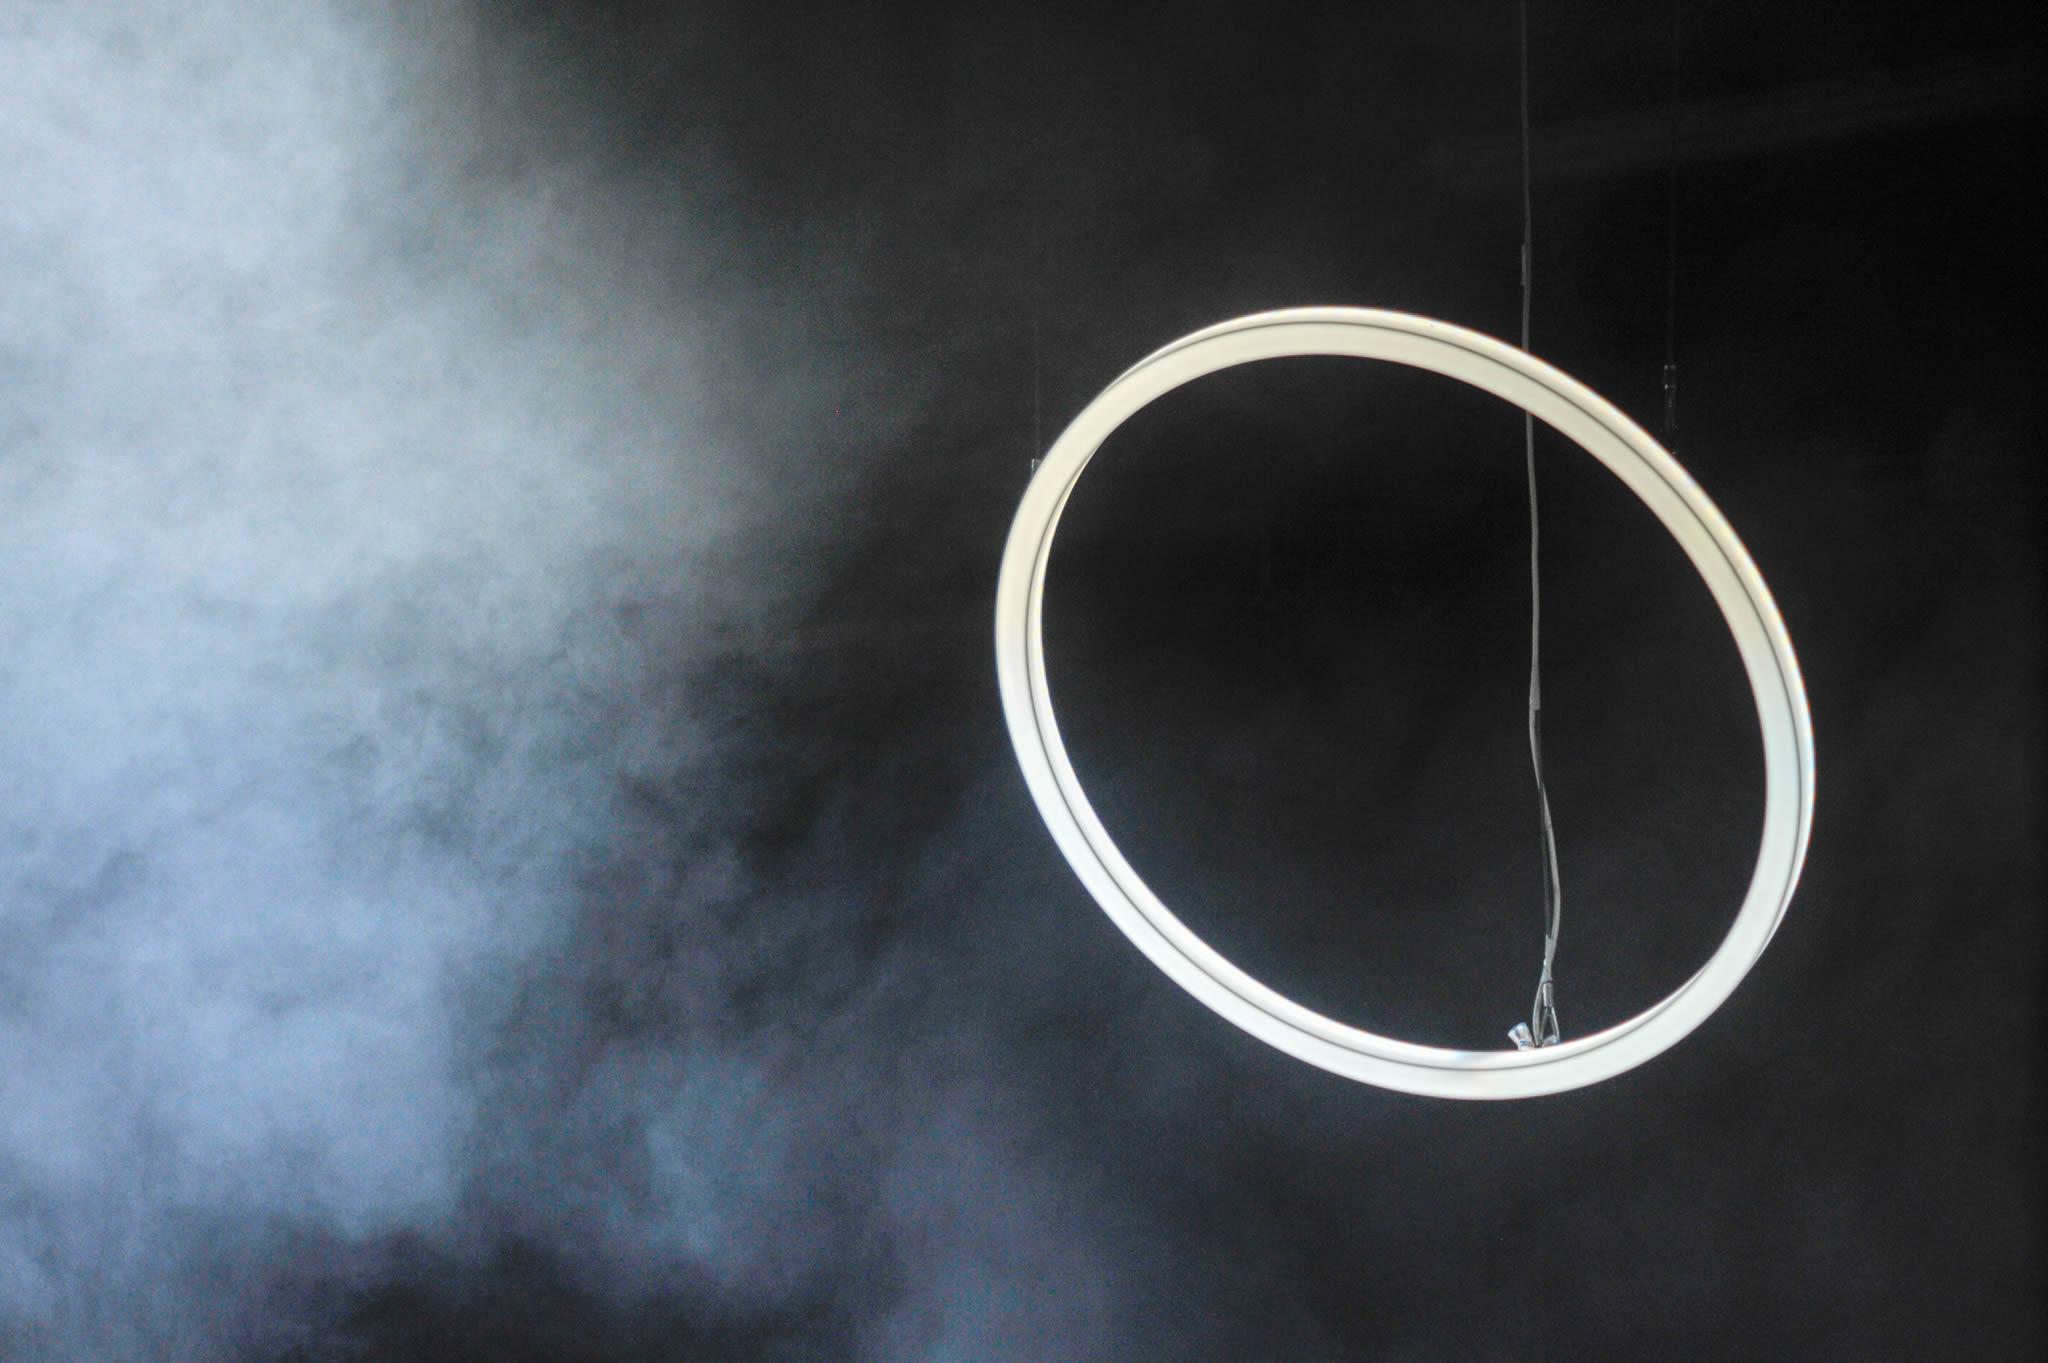 Led Ringleuchte TheO Nahaufnahme mit Nebel